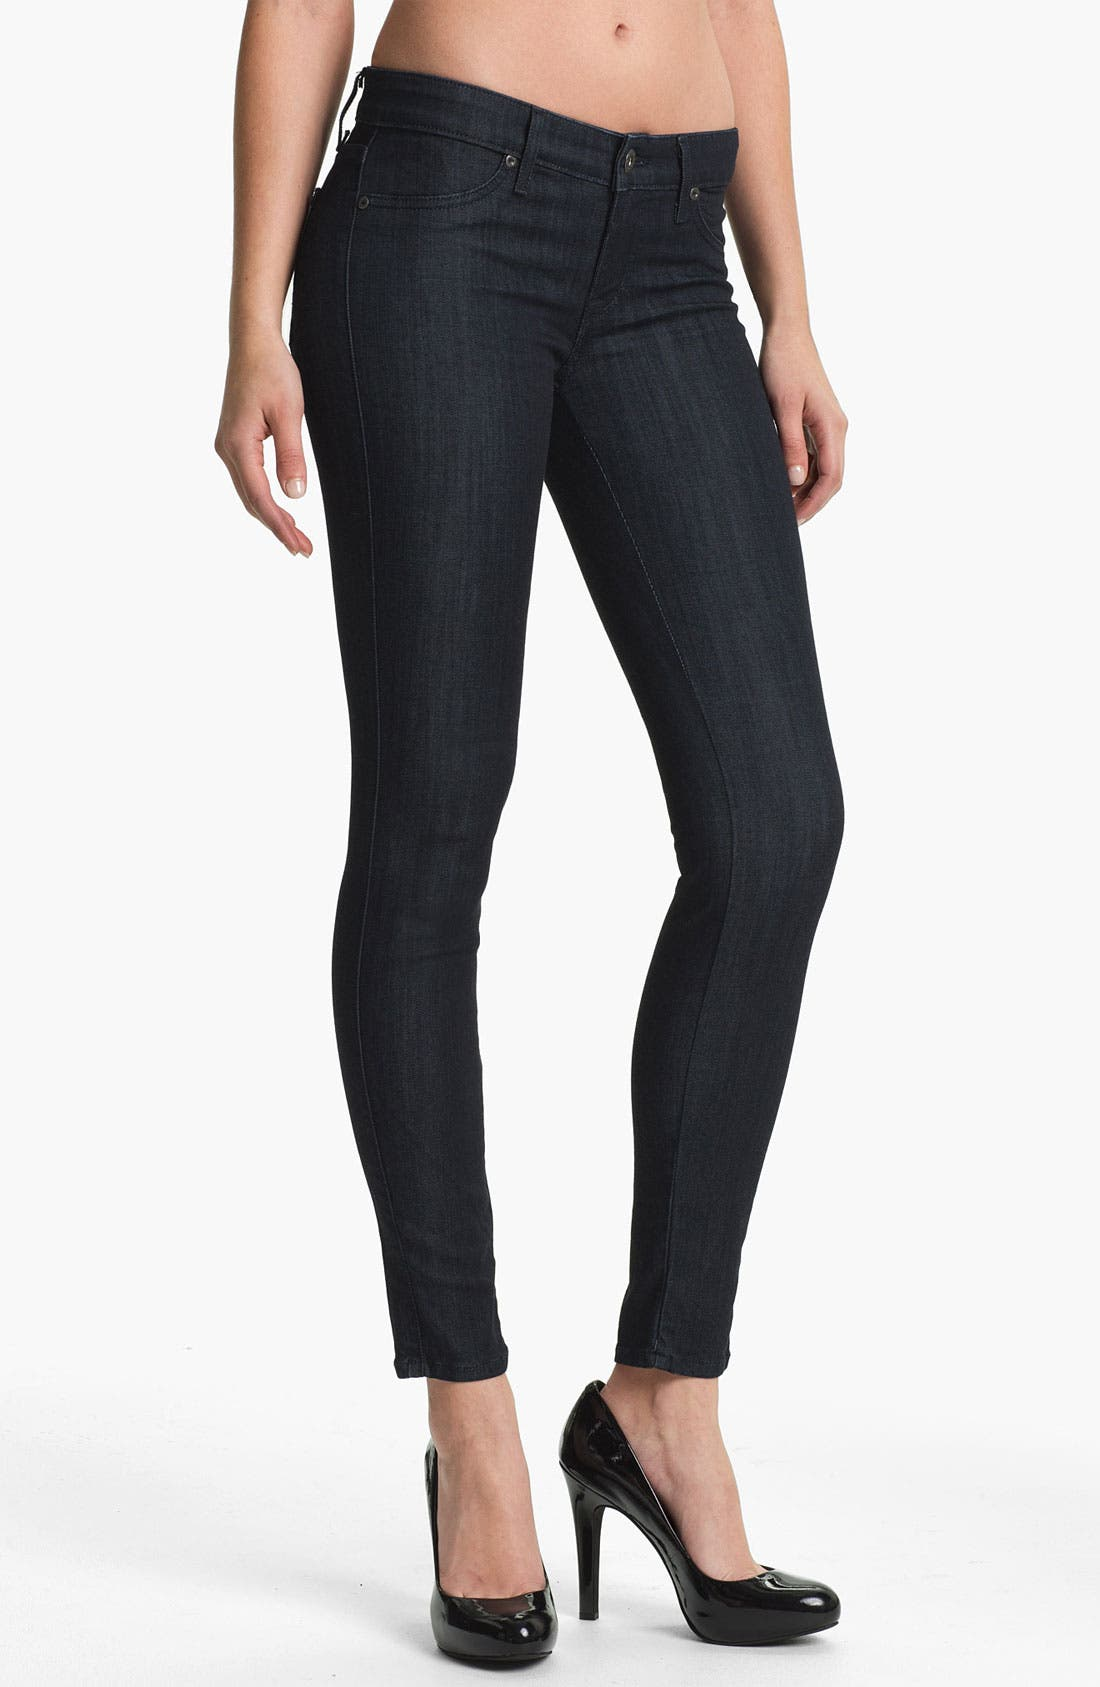 Main Image - Rich & Skinny 'Legacy' Skinny Jeans (Indigo Rinse)